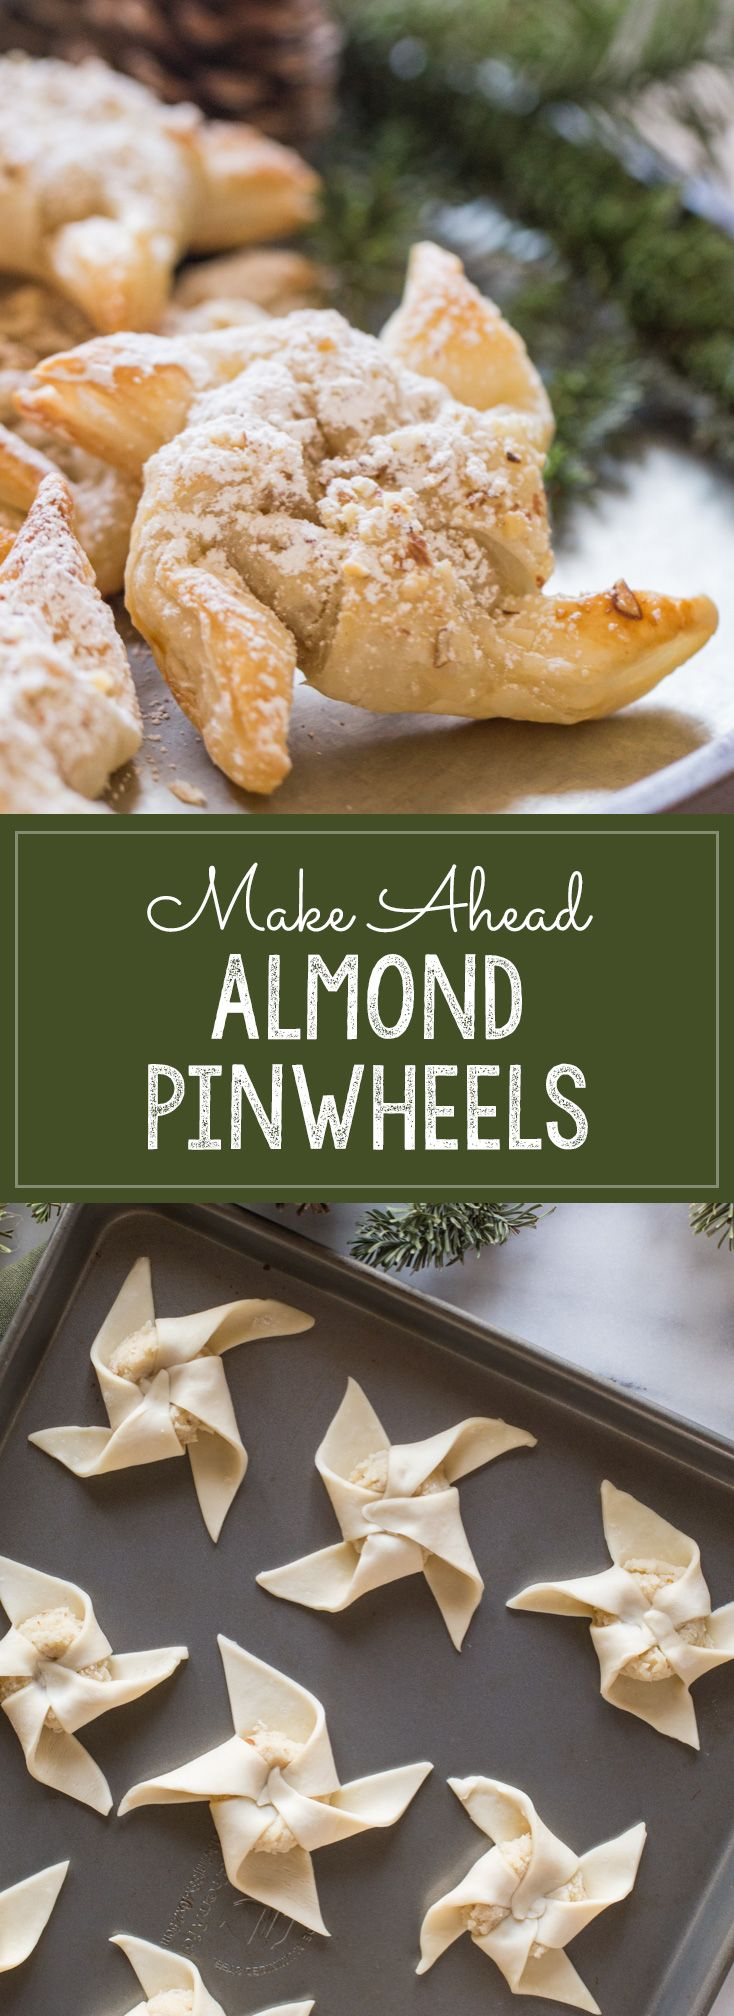 Make Ahead Almond Pinwheels - Lovely Little Kitchen